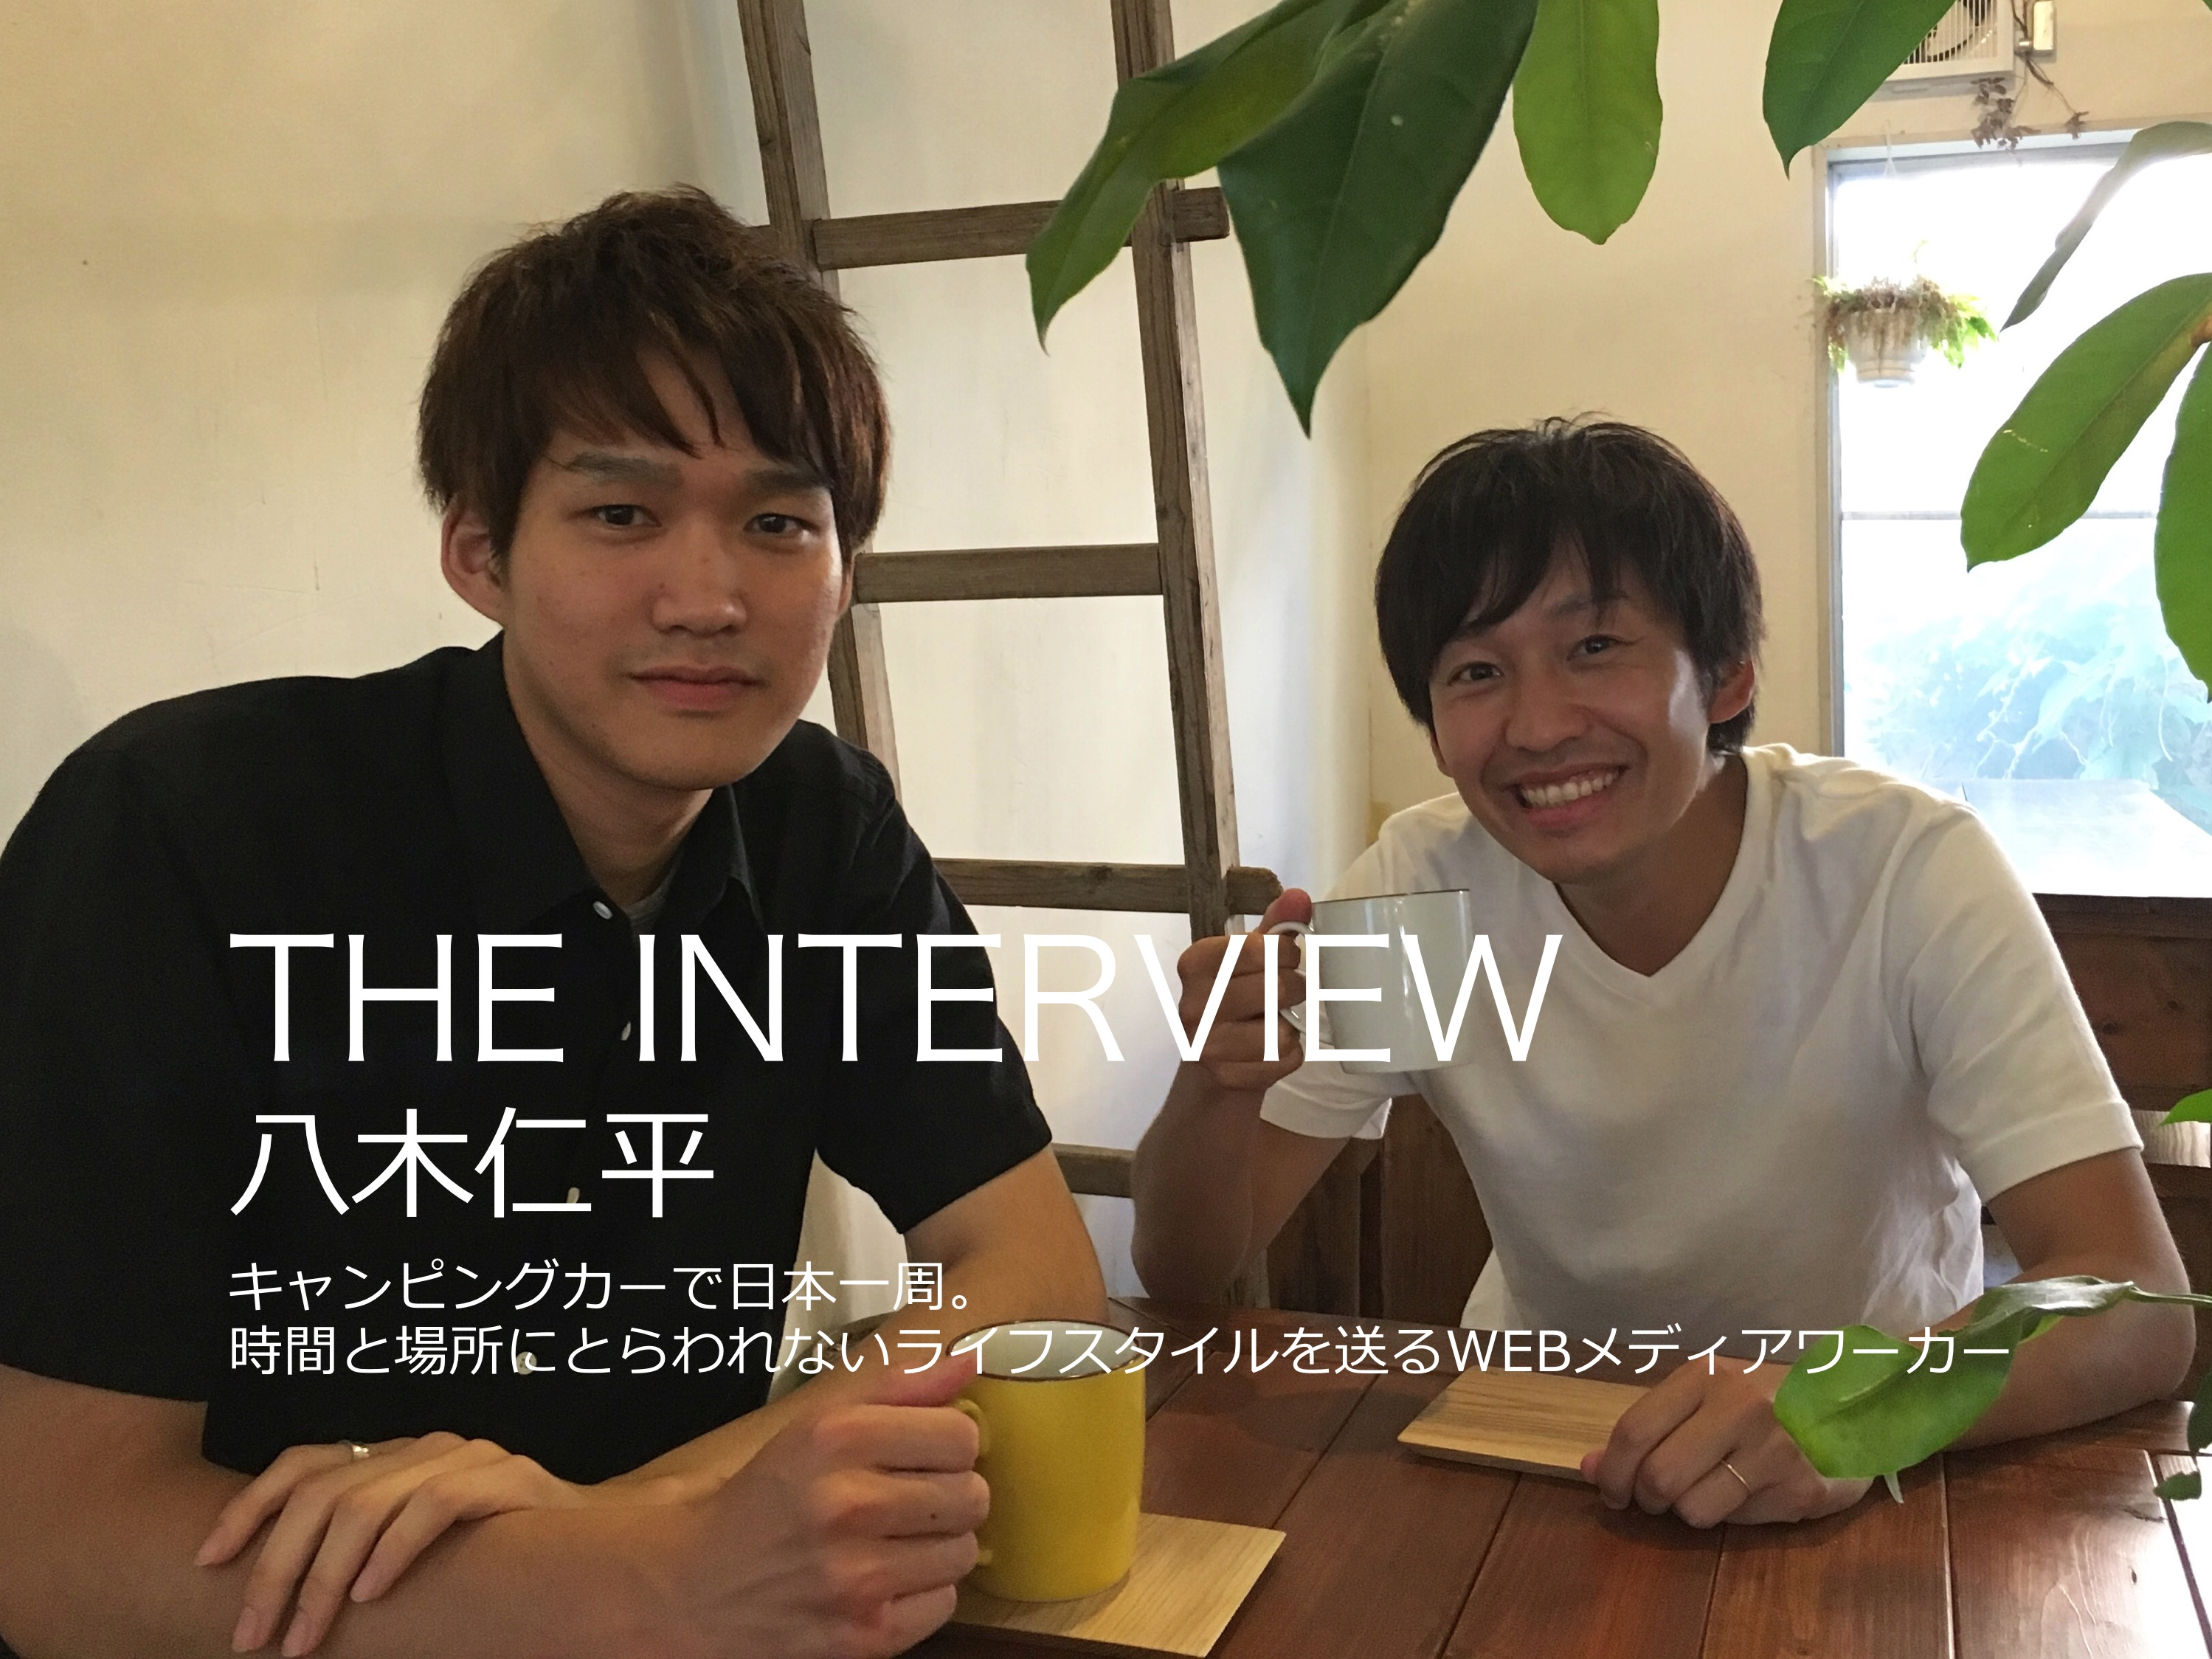 THE INTERVIEW:八木仁平(やぎろぐ、キャンピングカーで日本一周中のメディアワーカー)